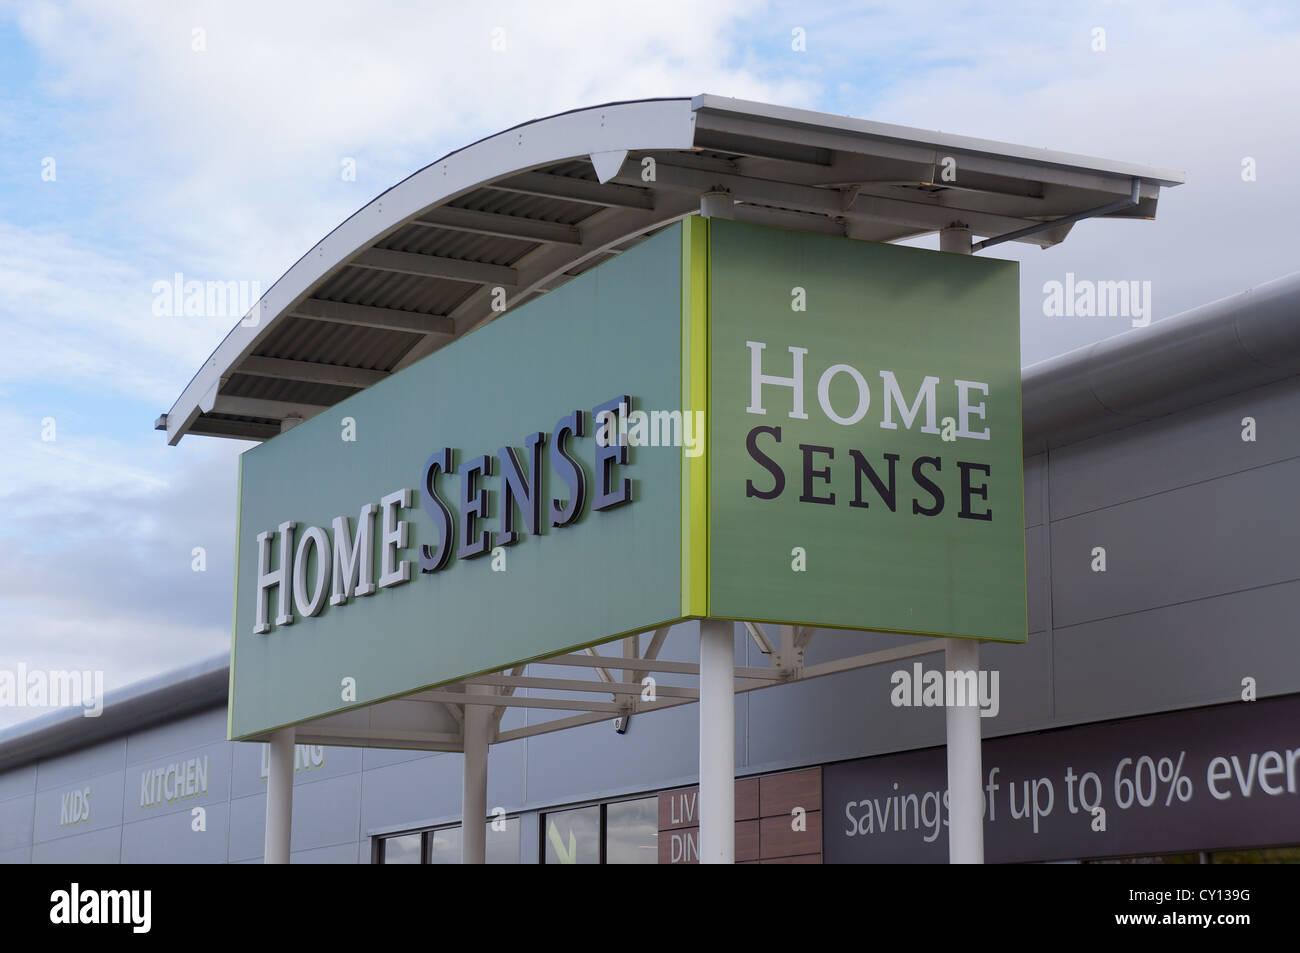 Home sense store, Merry Hill, Royaume-Uni Photo Stock